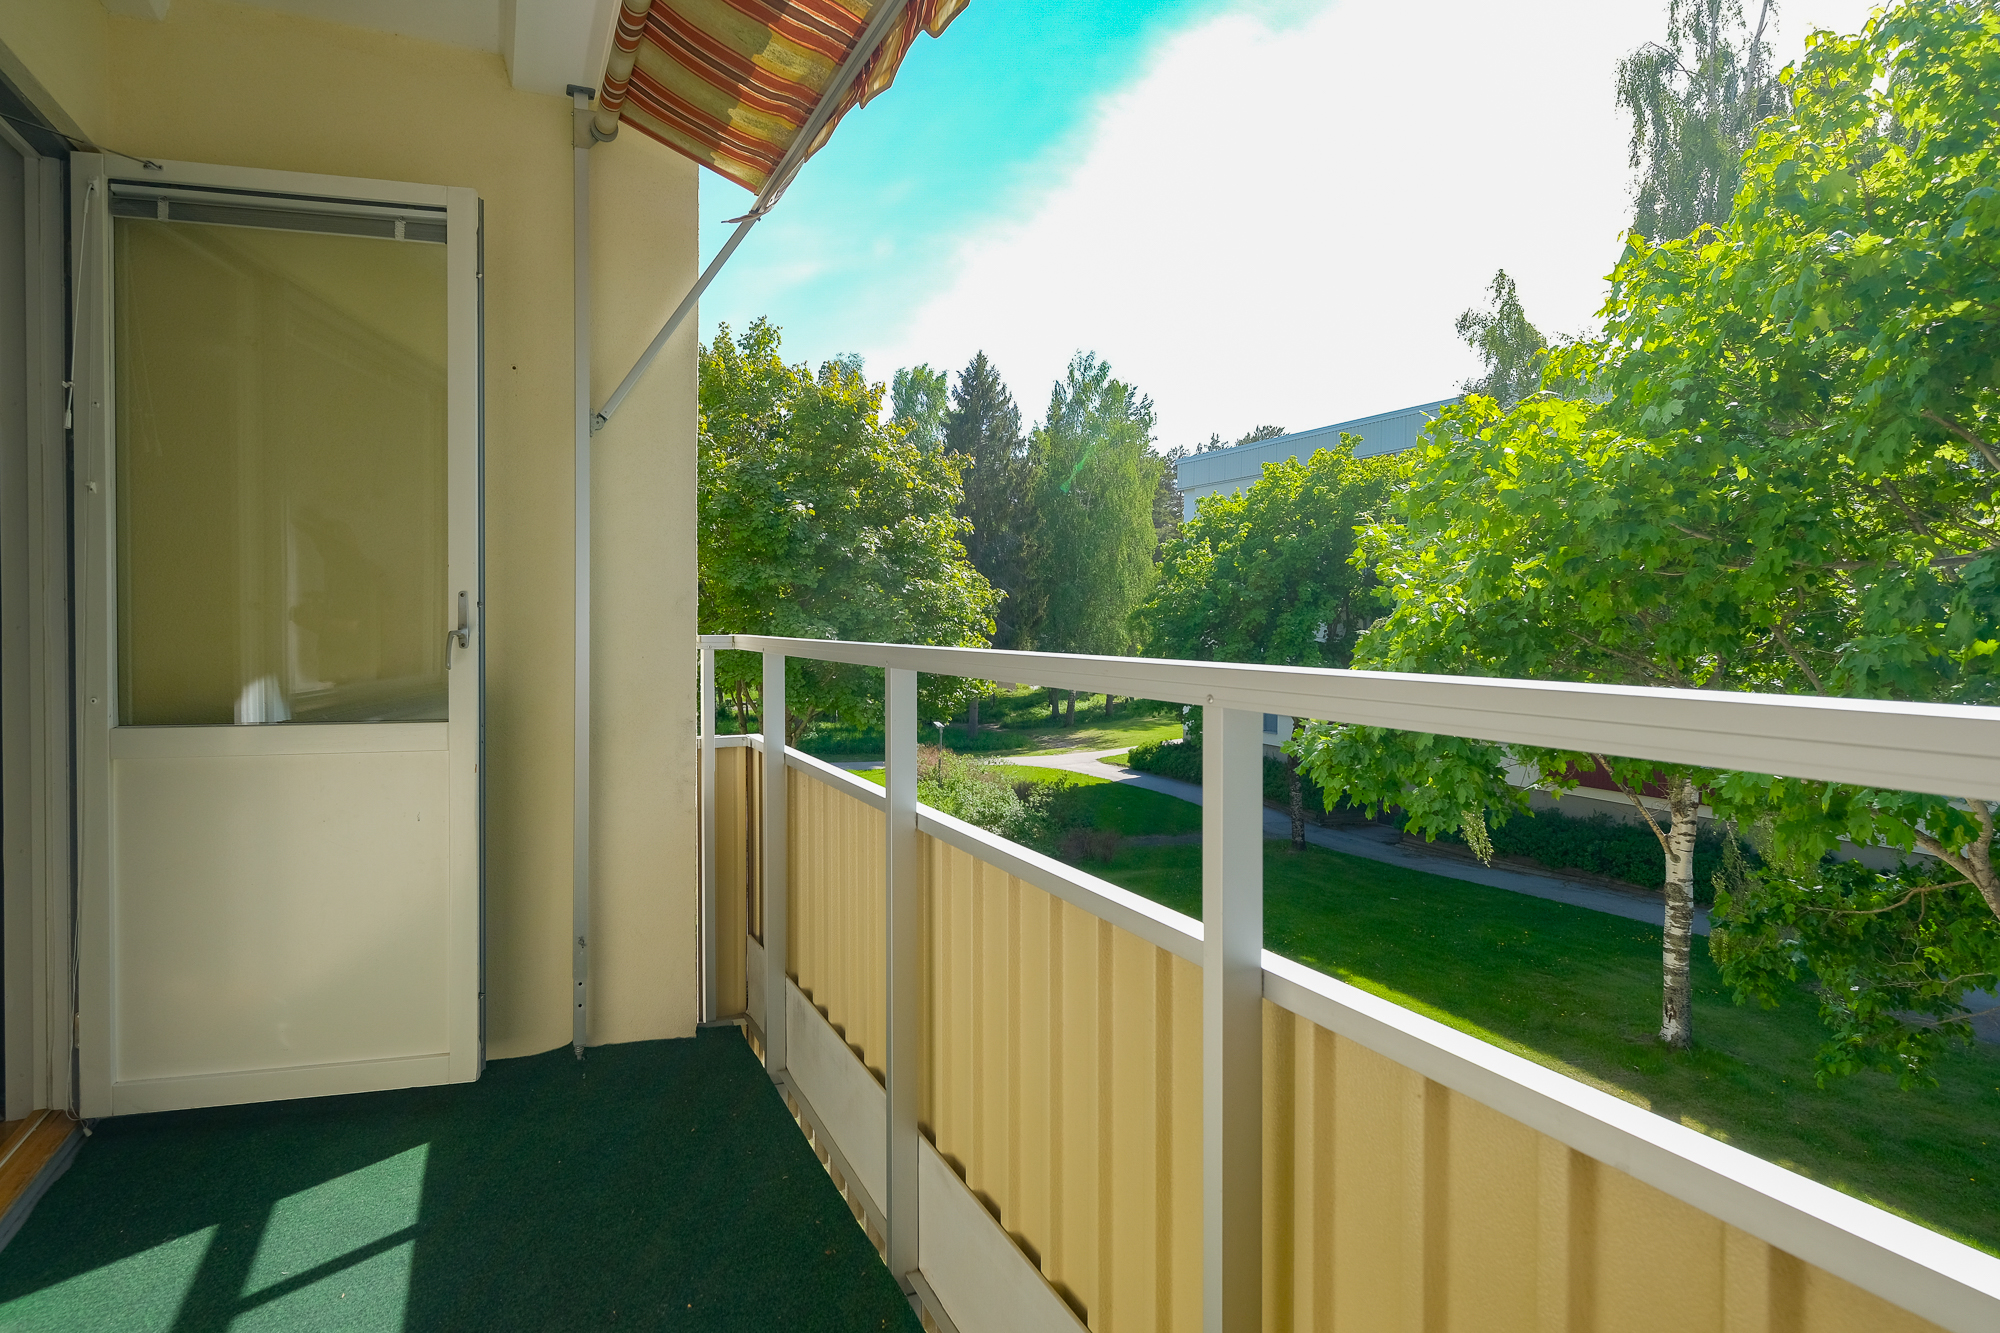 Balkong mot lummigt grönområde